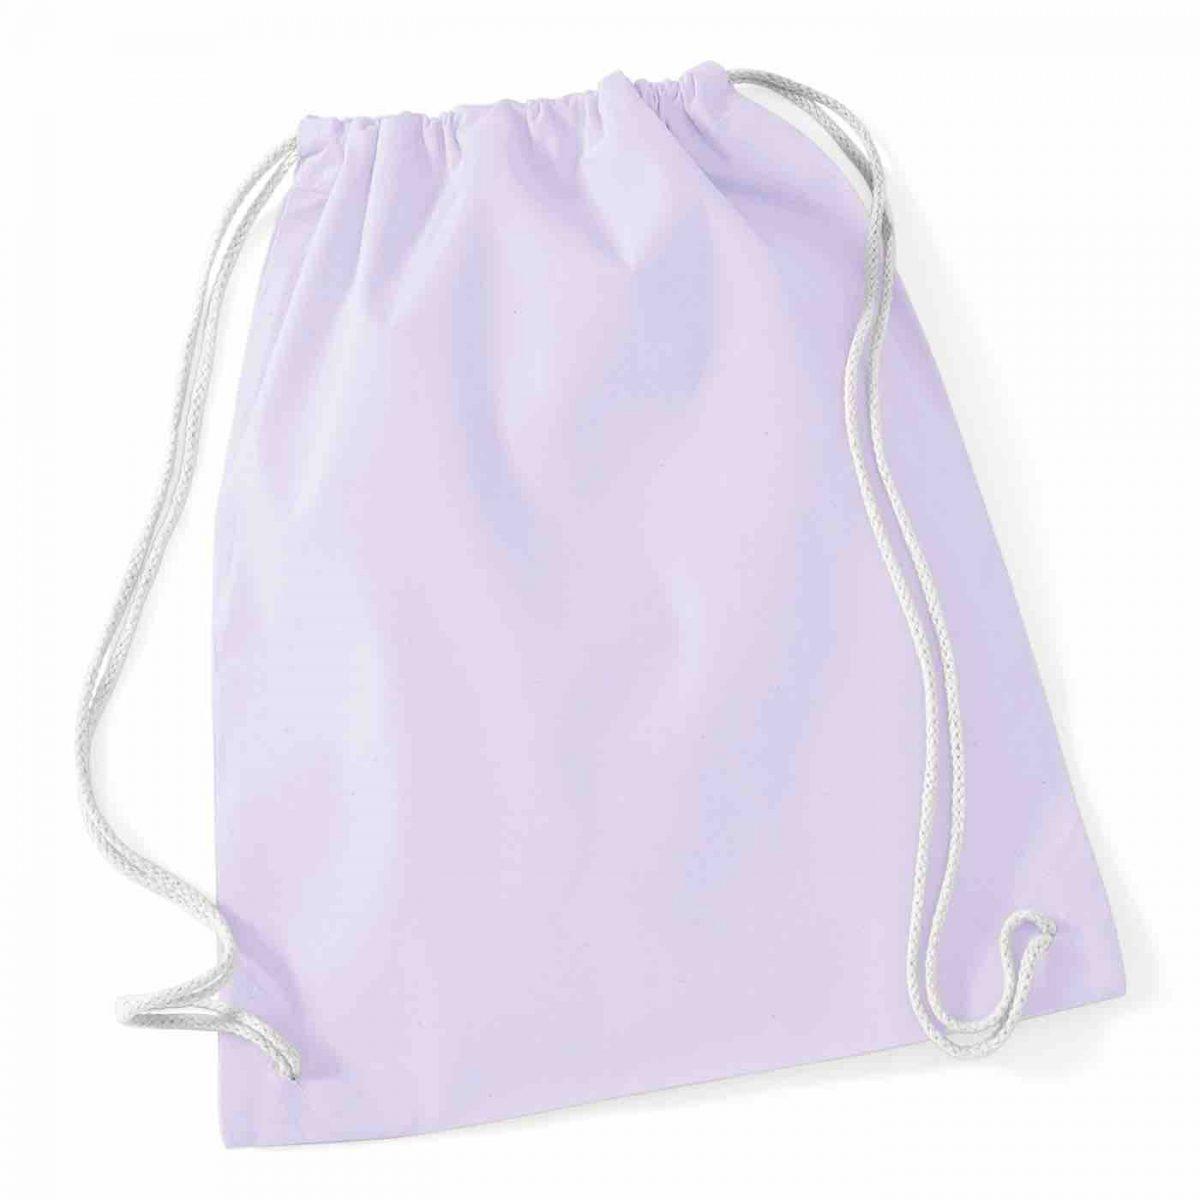 Lavendar Cotton Tote Bag